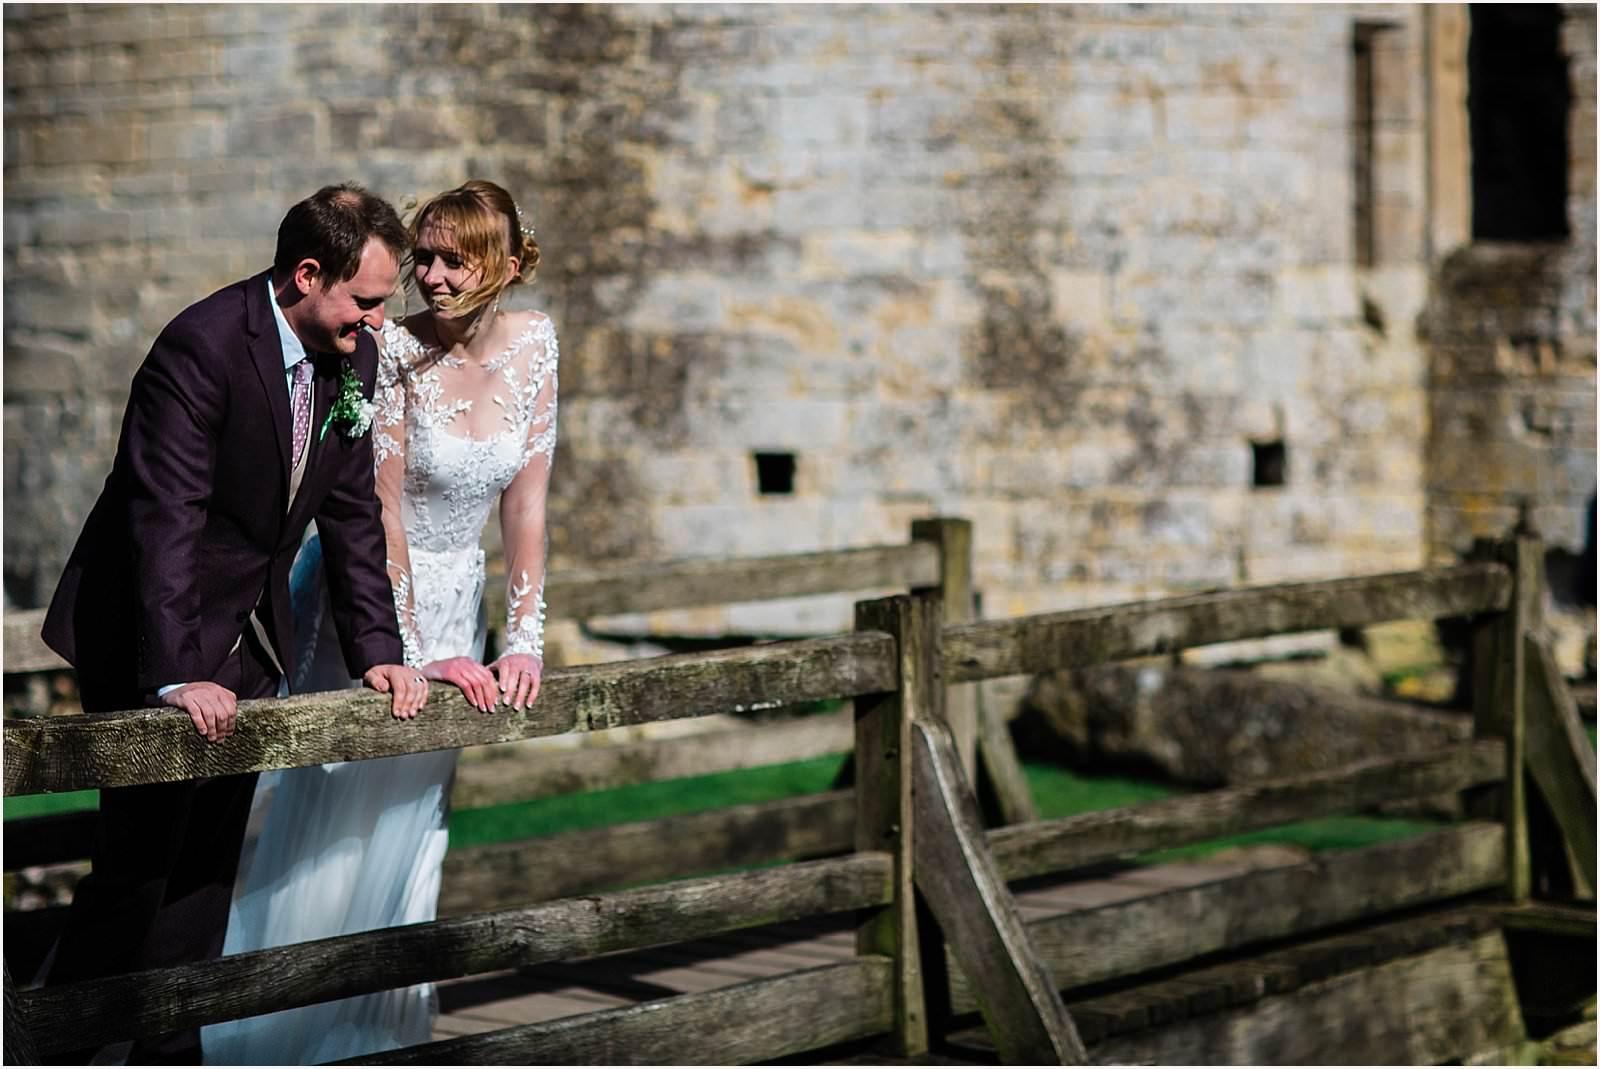 Breathtaking Nunney Castle, Somerset Wedding Photographer  - Sarah & Daniel 68